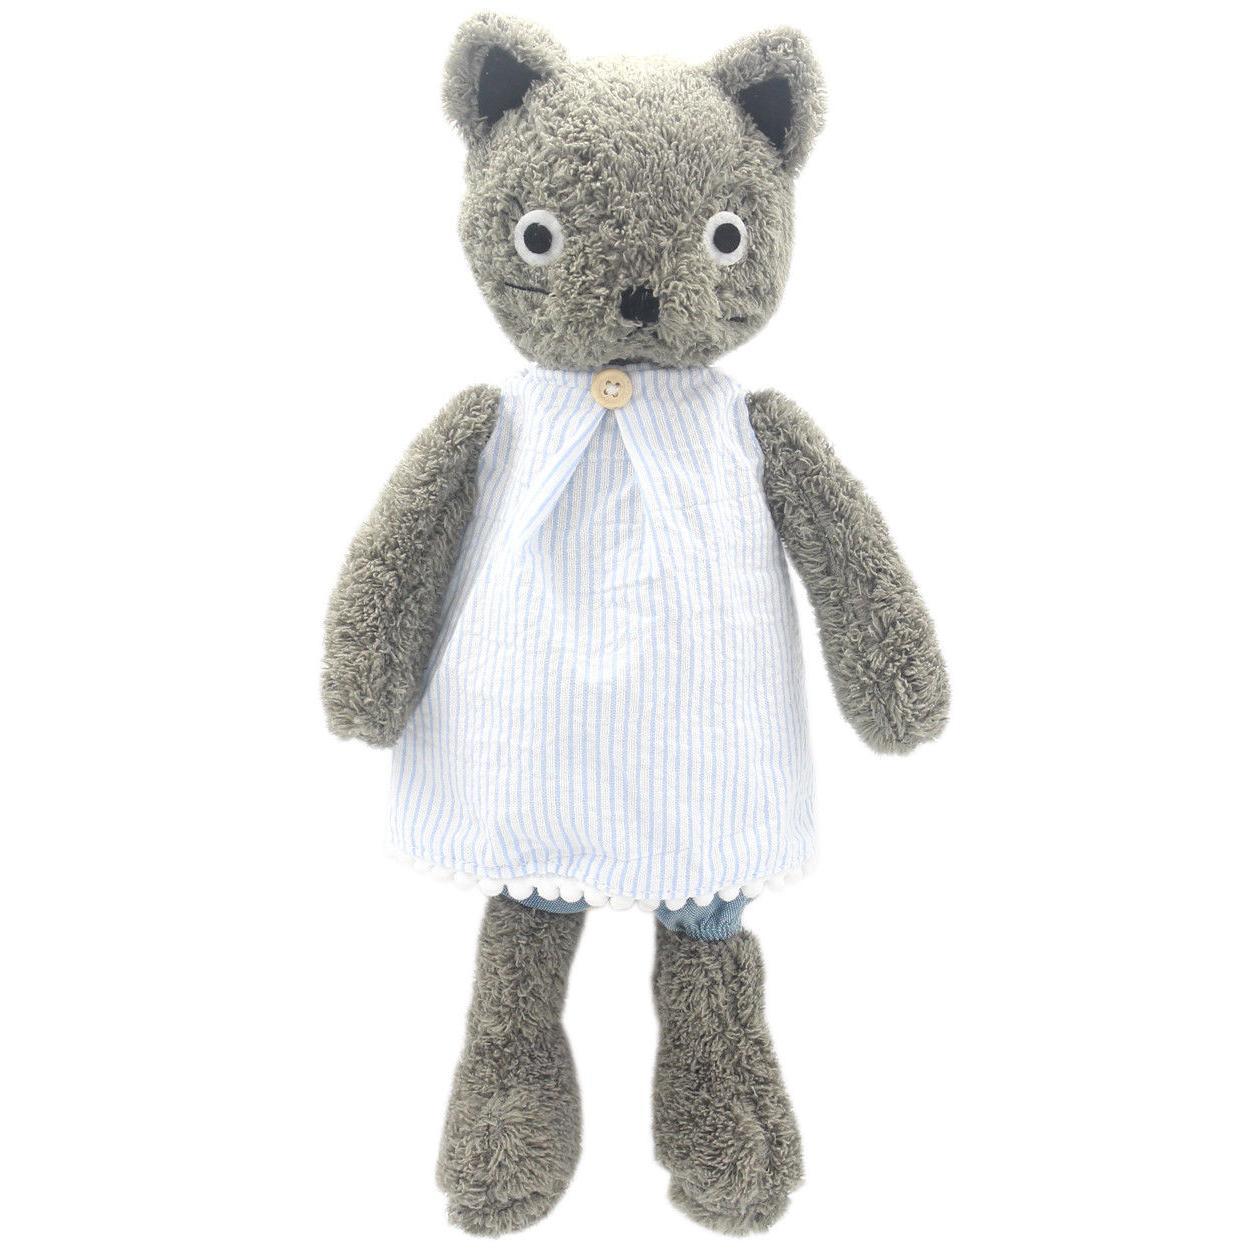 dressed stuffed animals grey cats